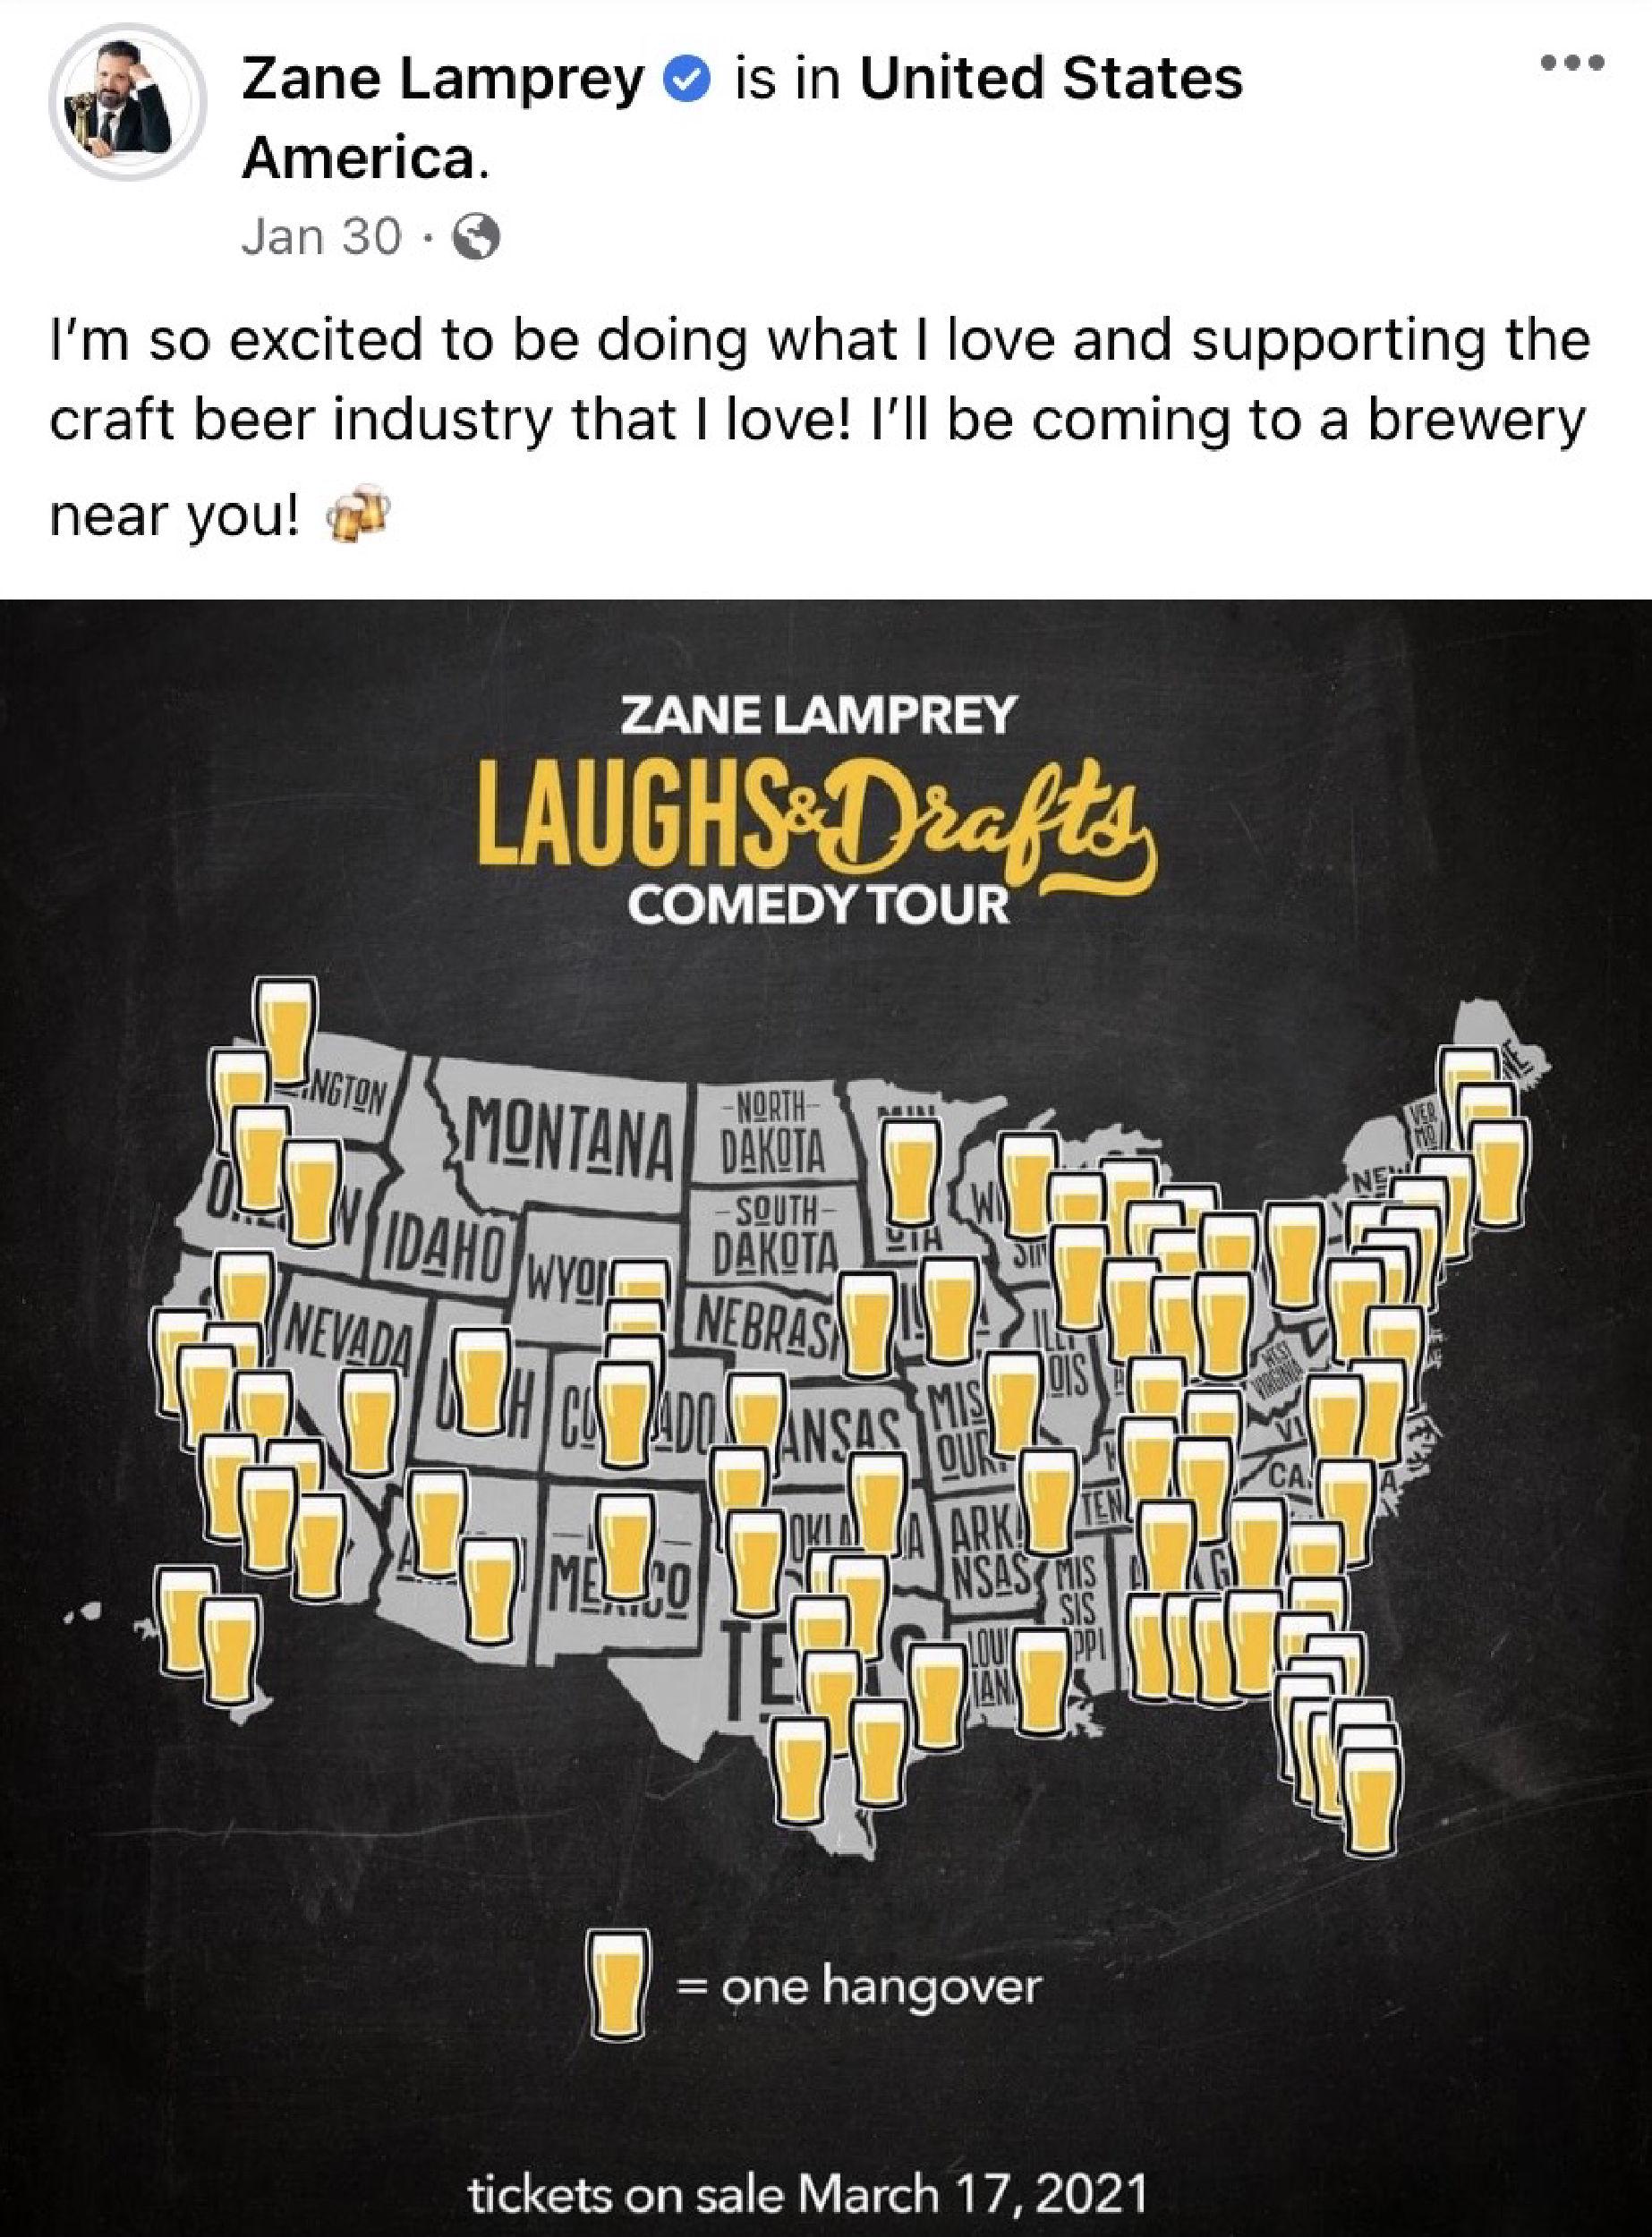 Laughs & Drafts Comedy Tour